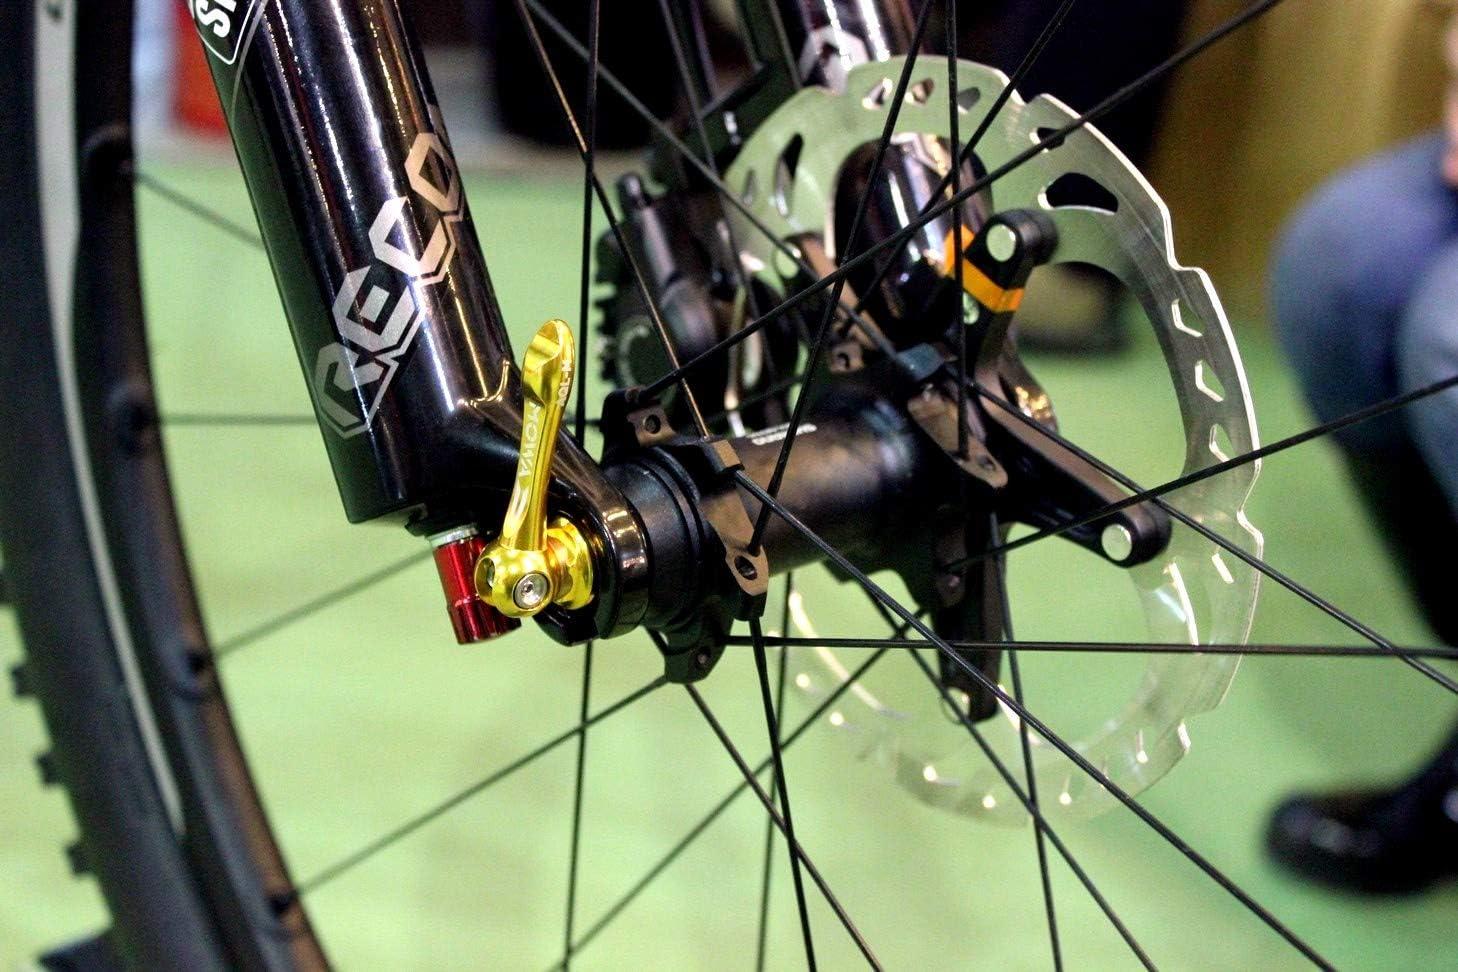 MOWA Road Cyclocross Cycling Bike Titanium Quick Release Ti QR Skewer Set Orange